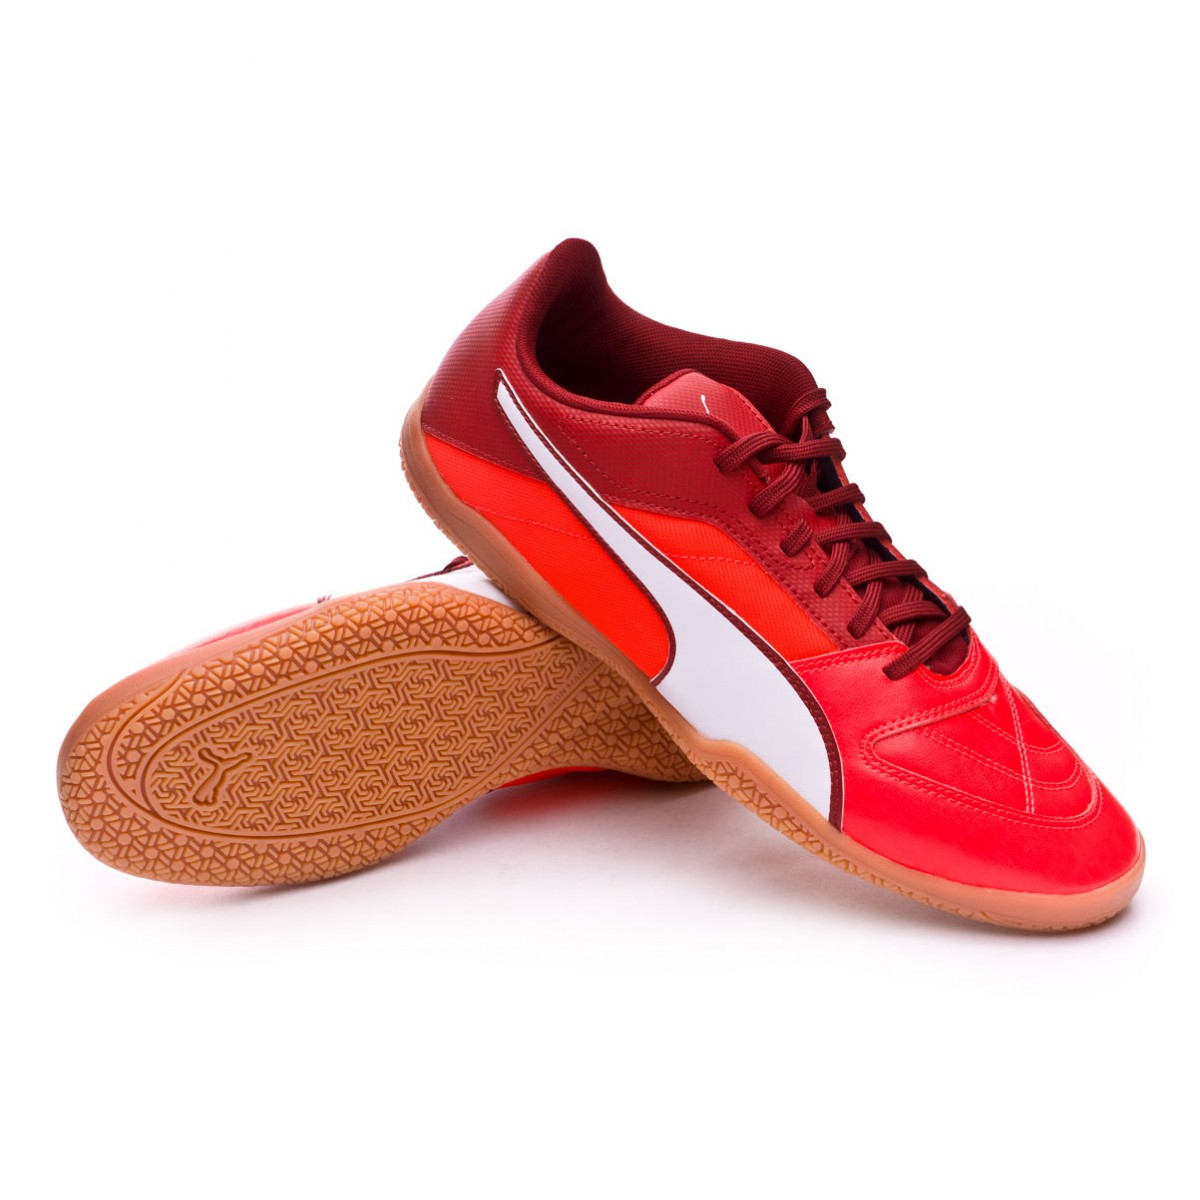 63974545e85 Futsal Boot Puma Gavetto II Red Blast-Puma White-Red Dahlia ...